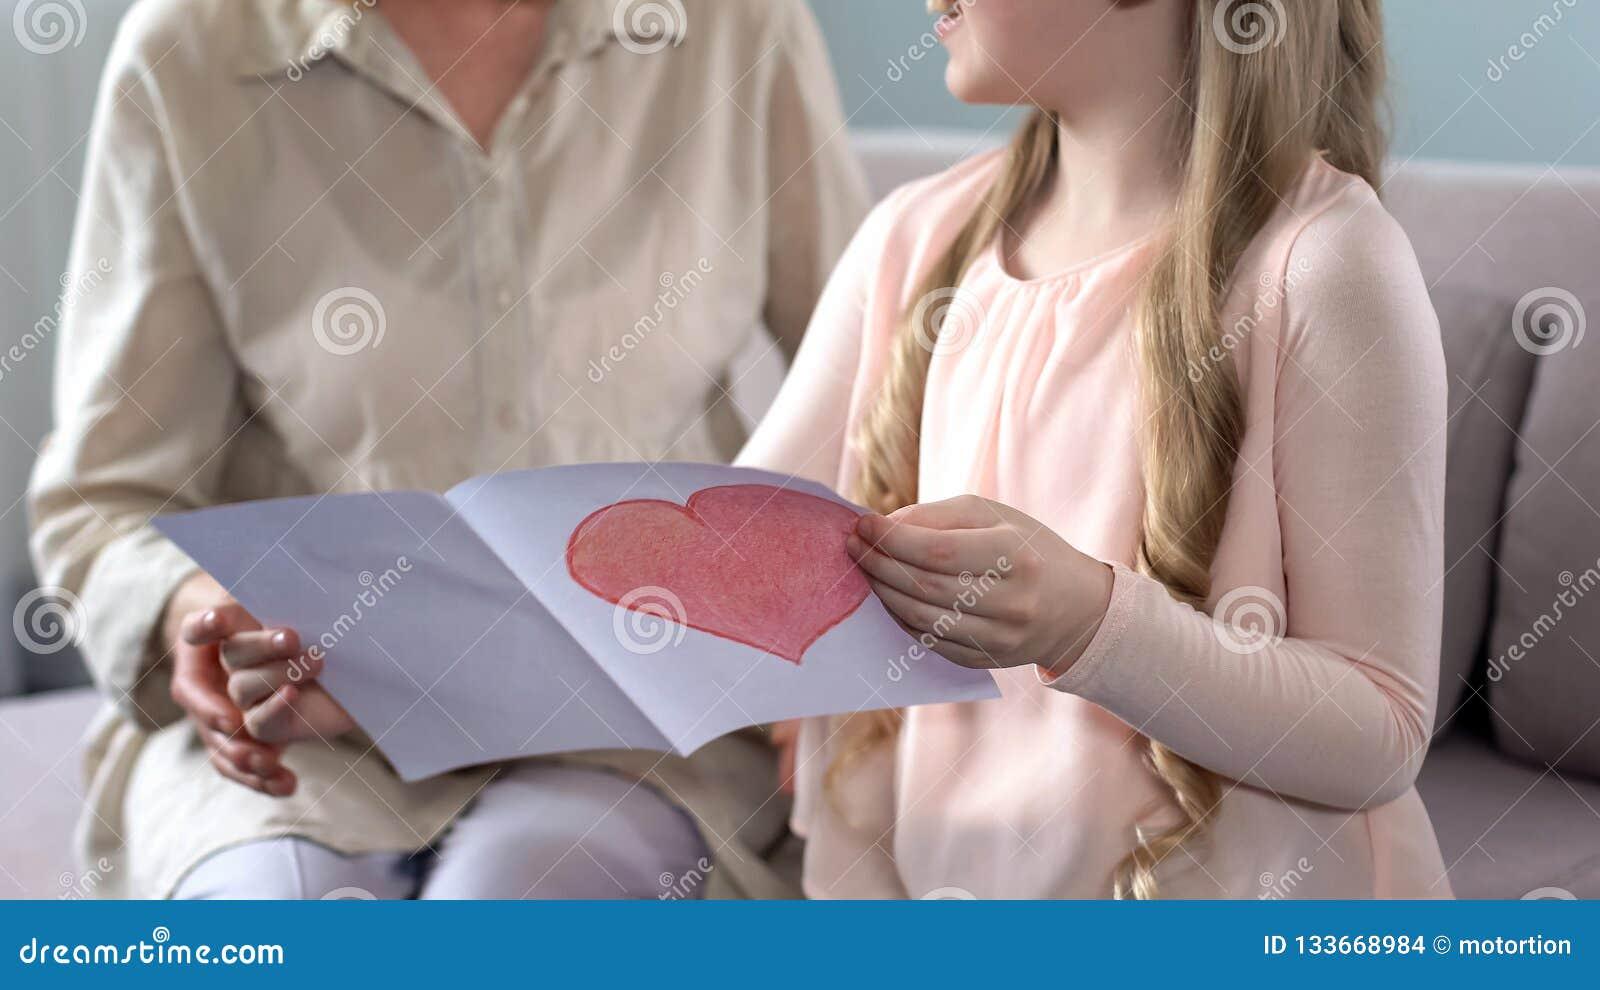 Cute little granddaughter presenting handmade greeting card to grandma, birthday